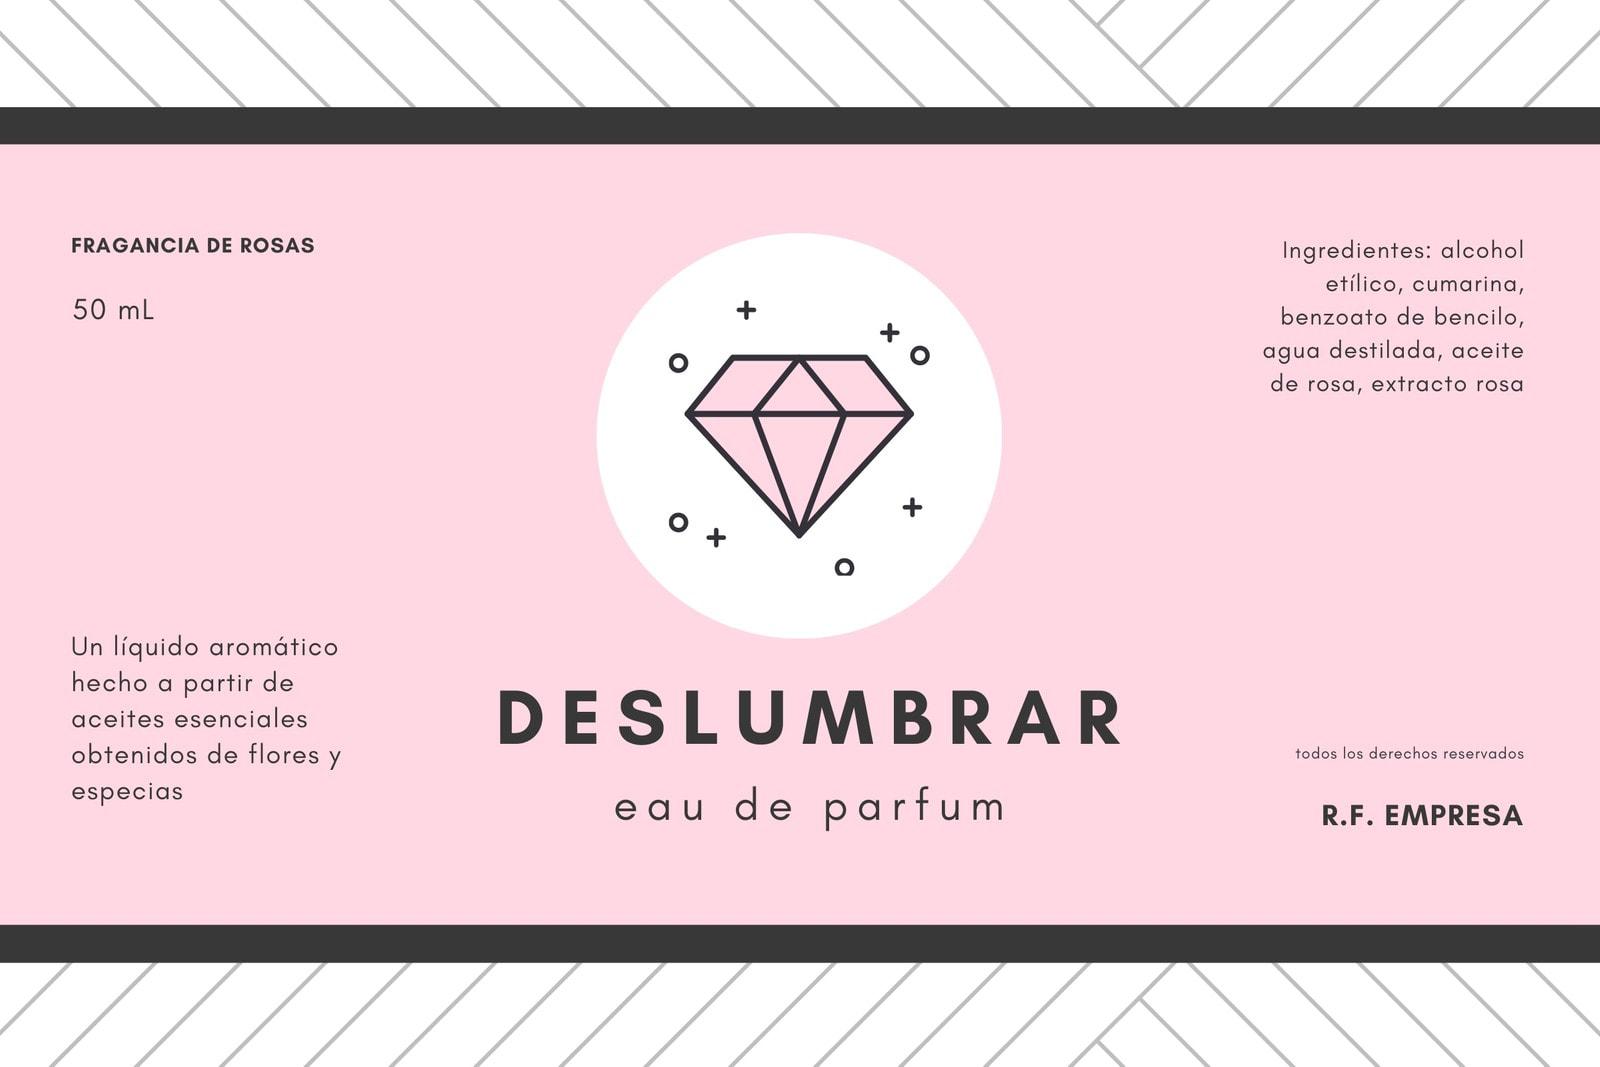 Rosa Blanco Negro Diamante Perfume Producto Etiqueta